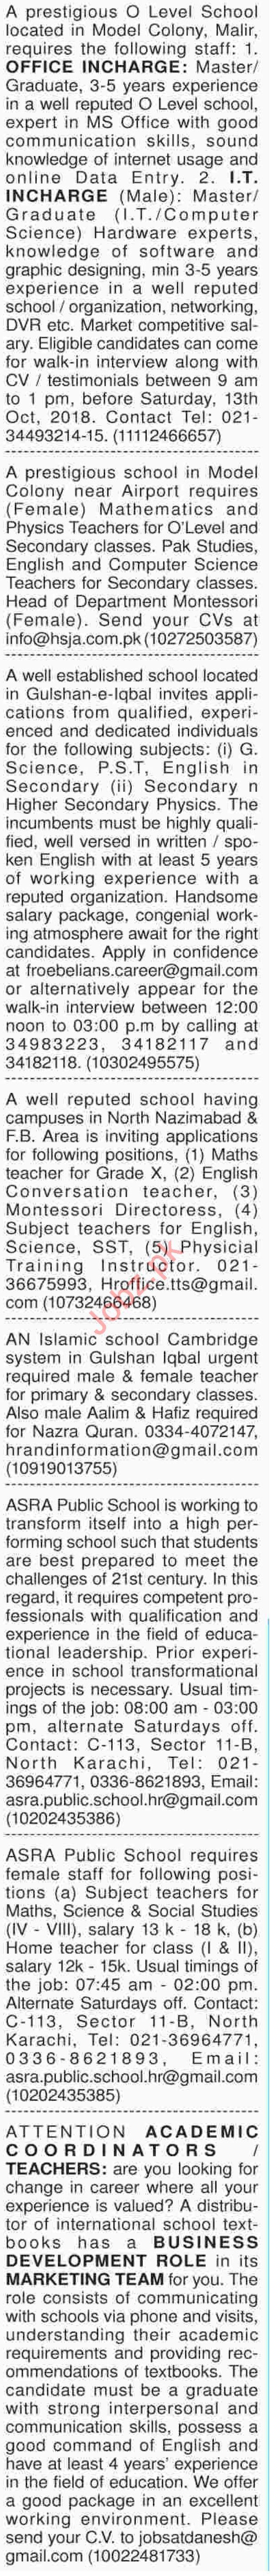 Dawn Sunday Teachers Classified Ads 7/10/2018